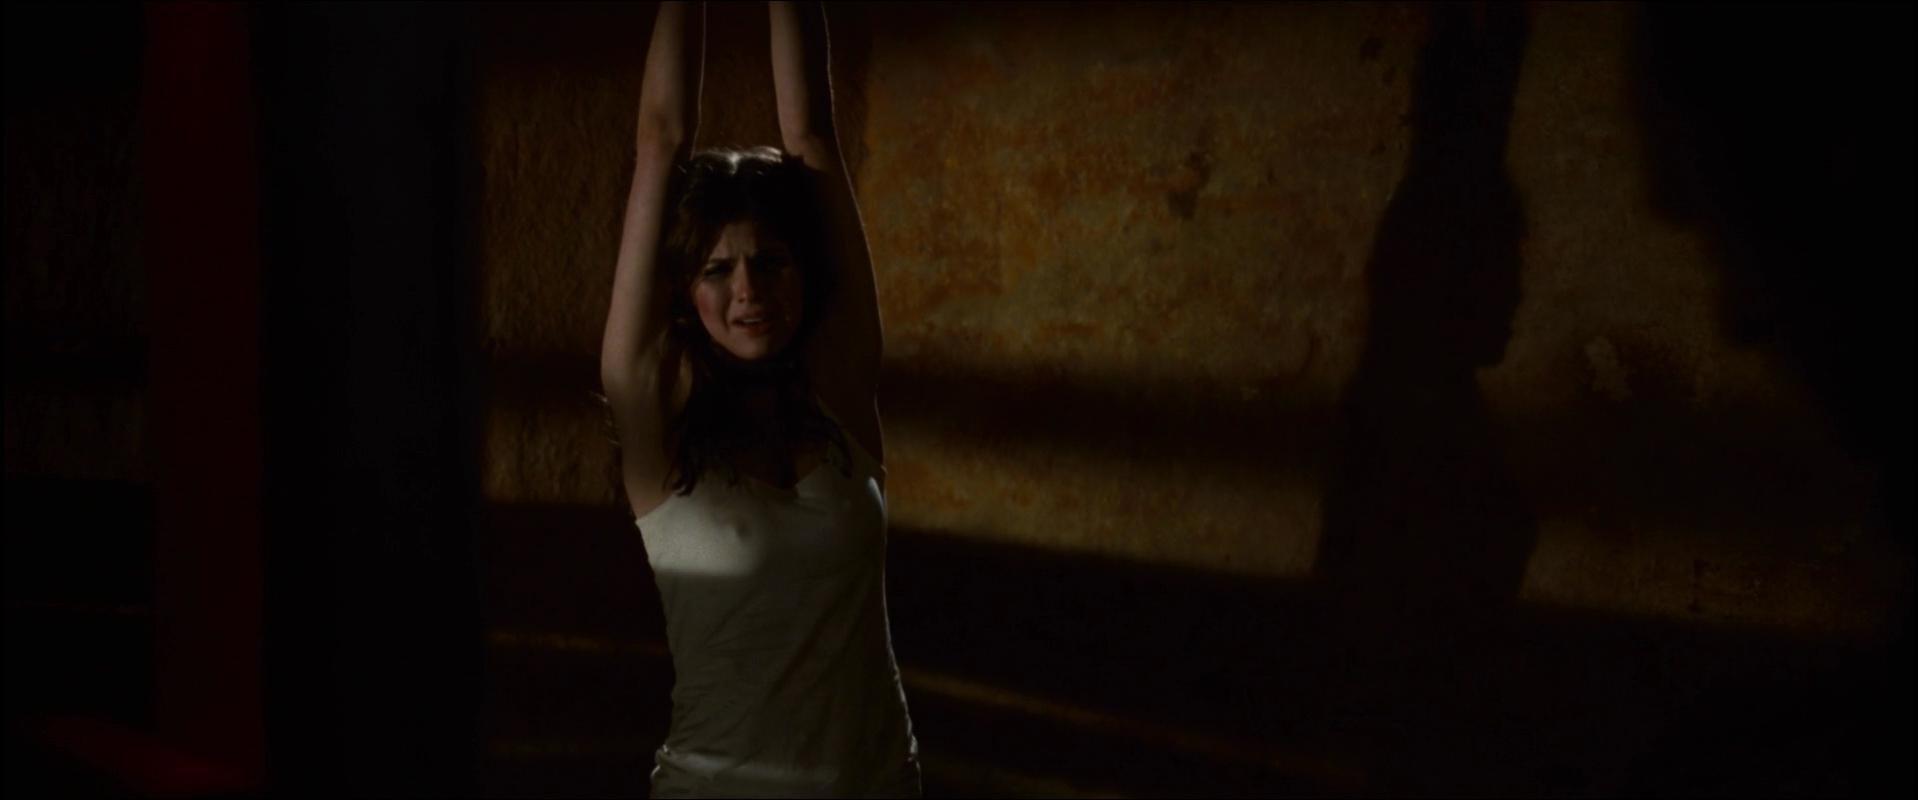 Alexandra daddario full frontal sex scene in true detective - 2 part 9